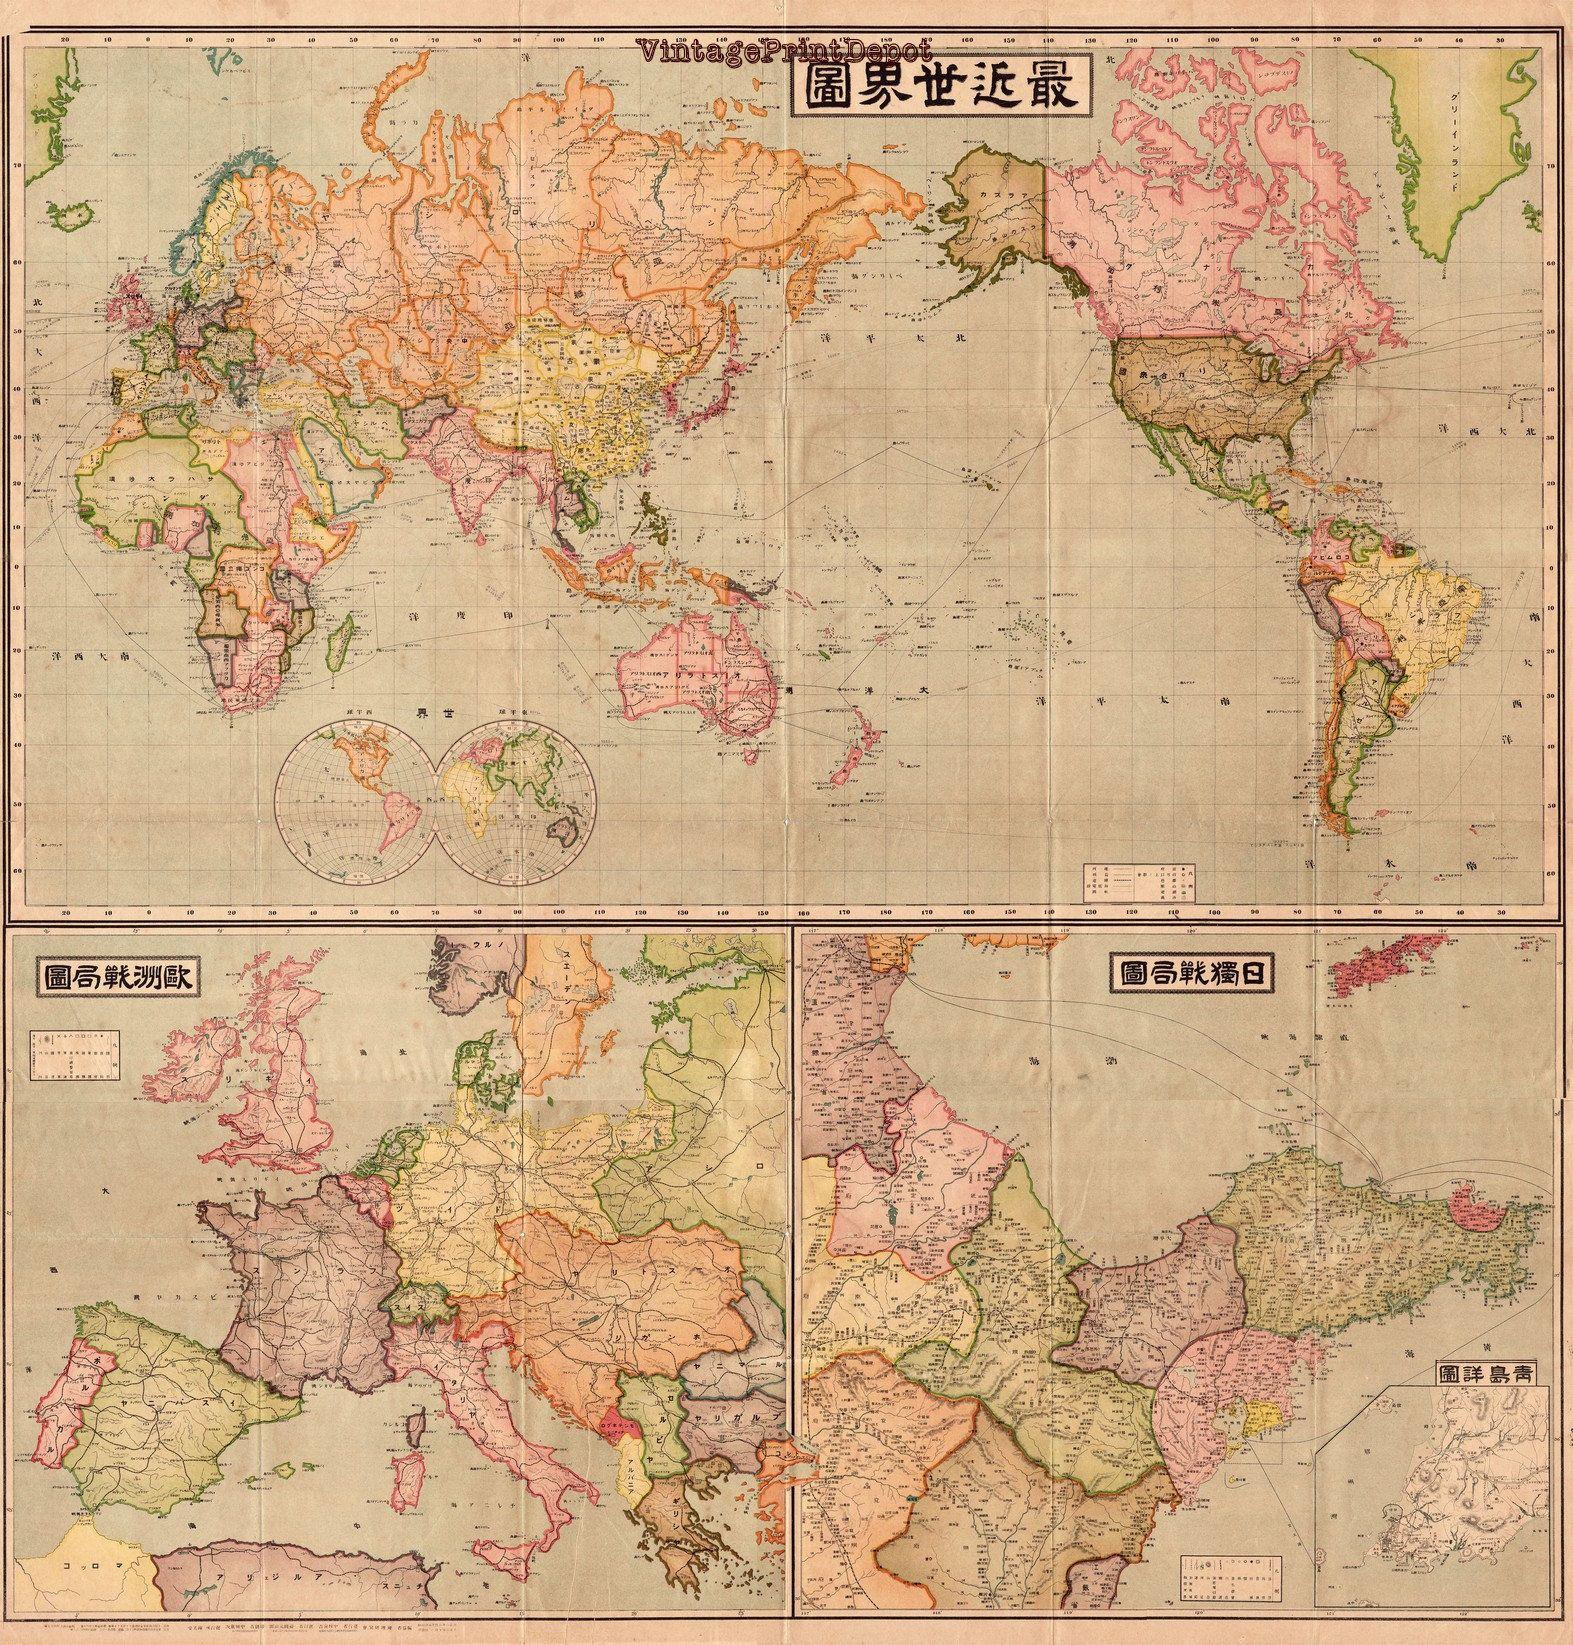 Japan On A World Map 1914 Japan World Map, Vintage Japan World Map, Japan World Map